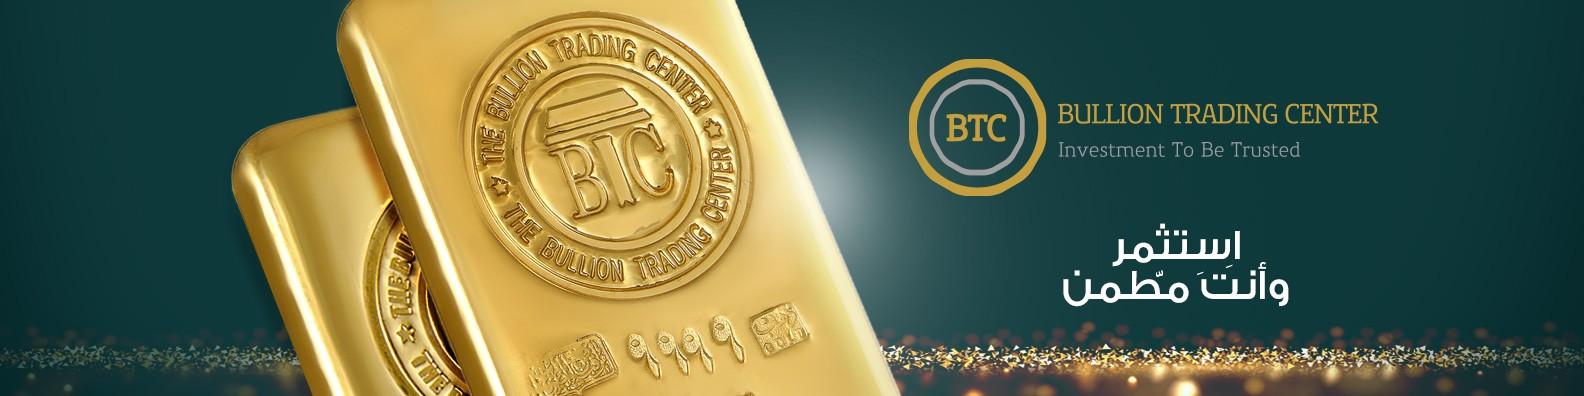 btc trading cairo